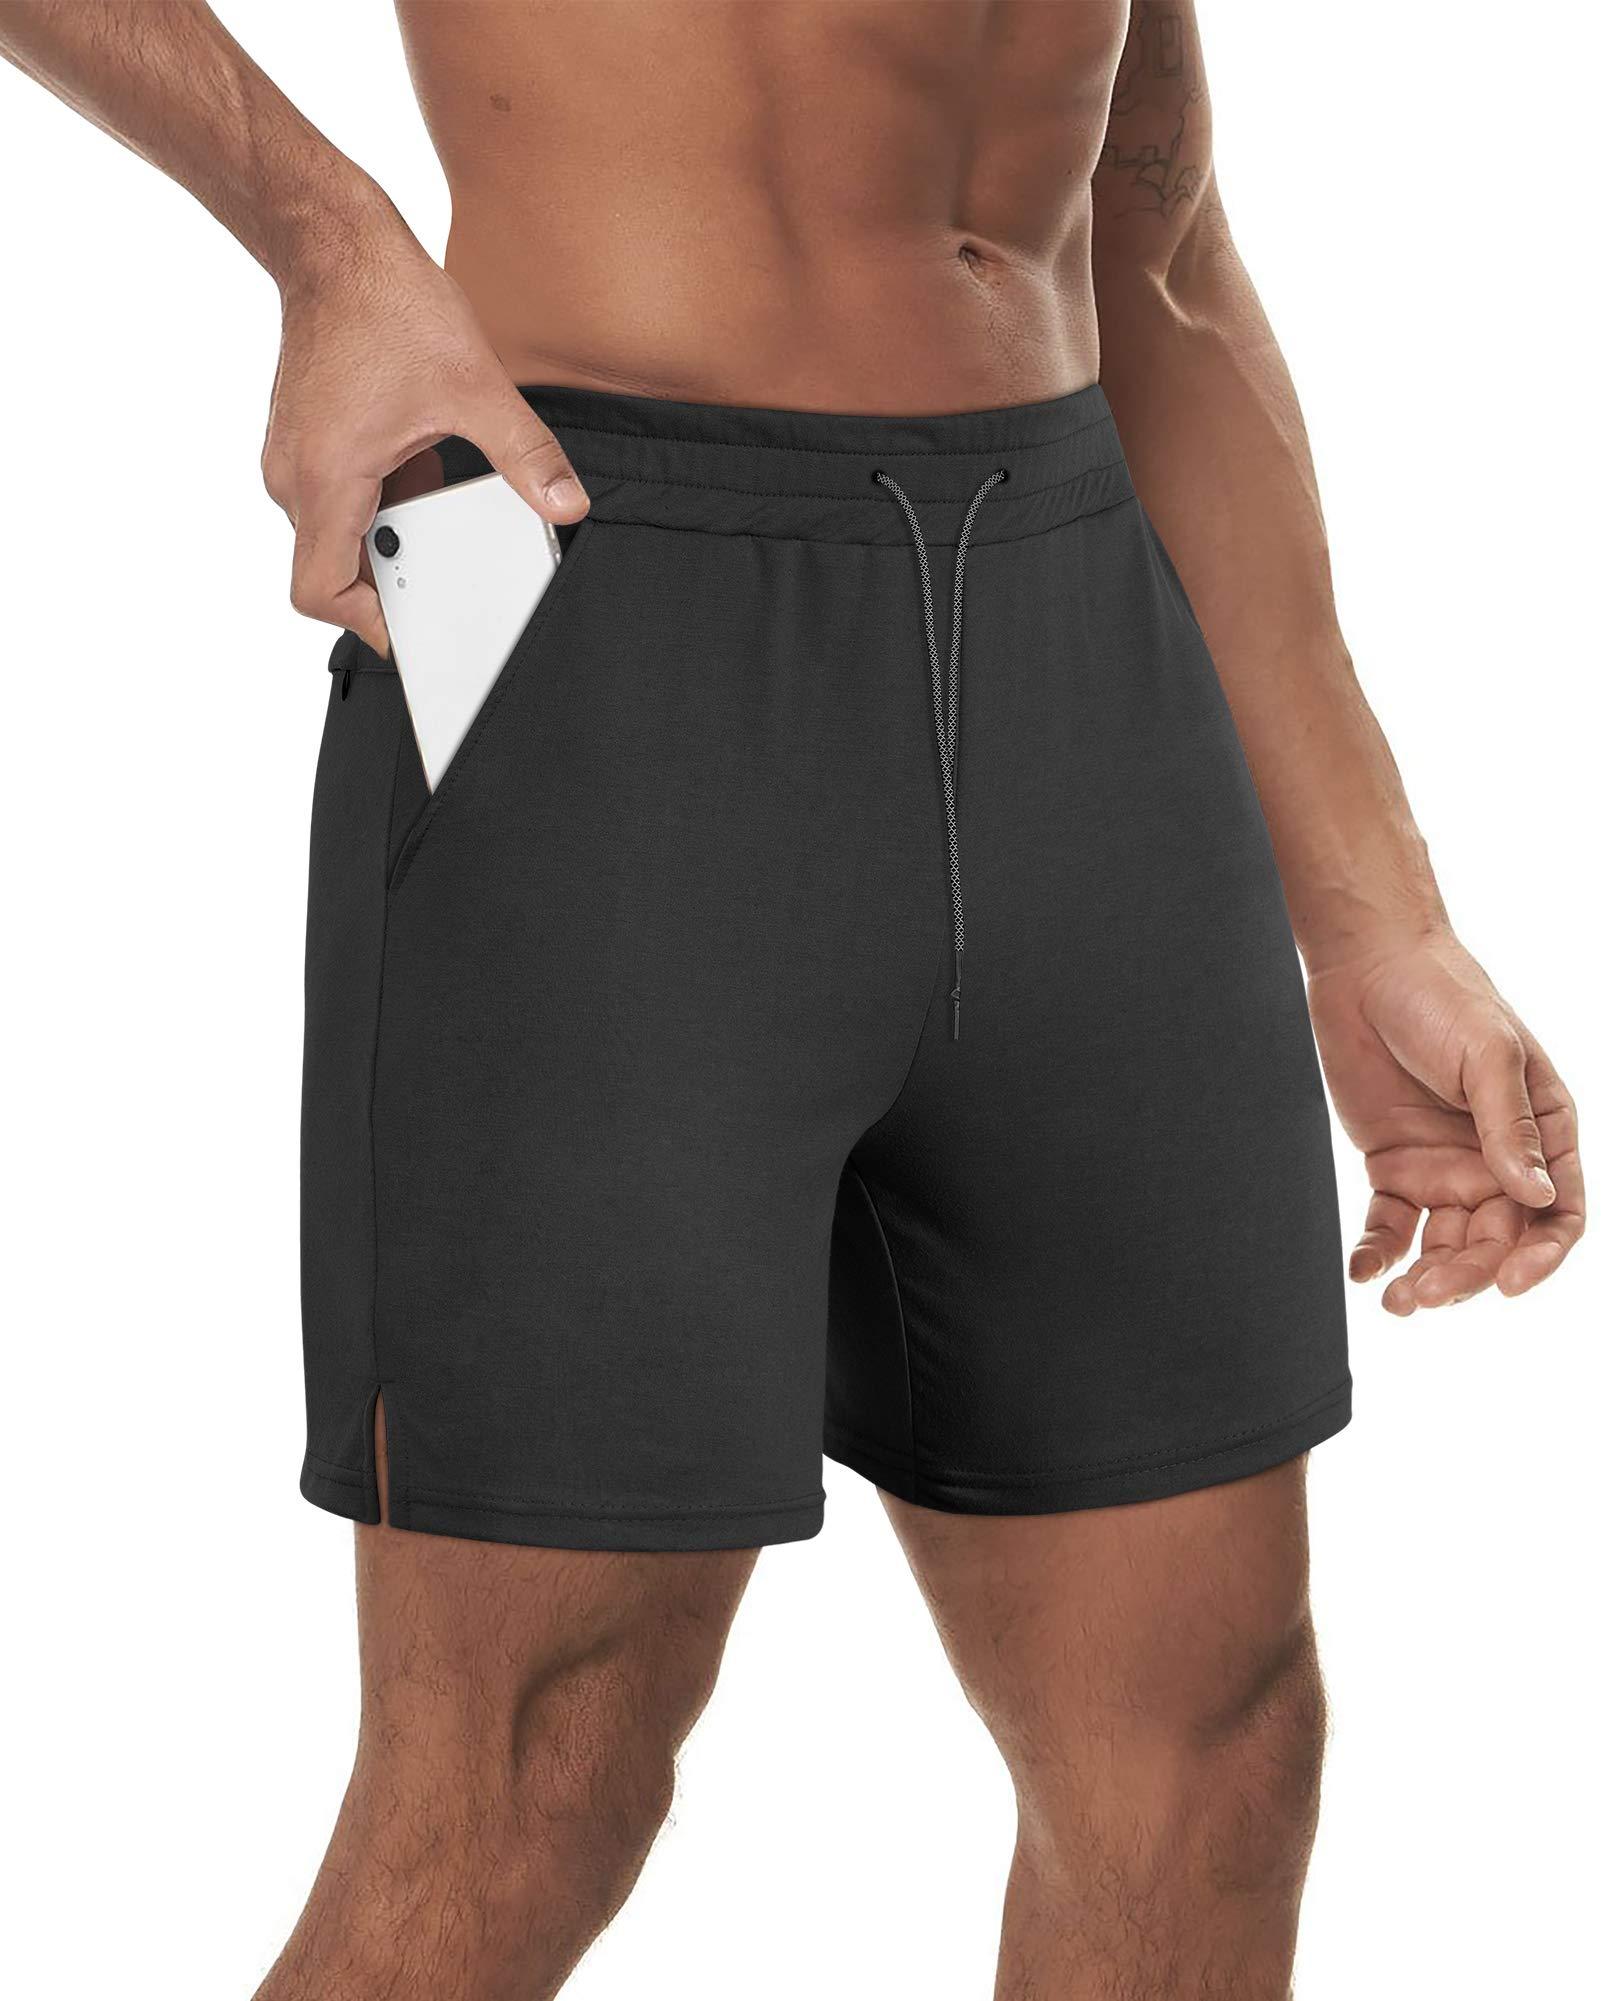 "Milin Naco Mens 7"" Drawstring Athletic Workout Shorts for Men with Pockets"